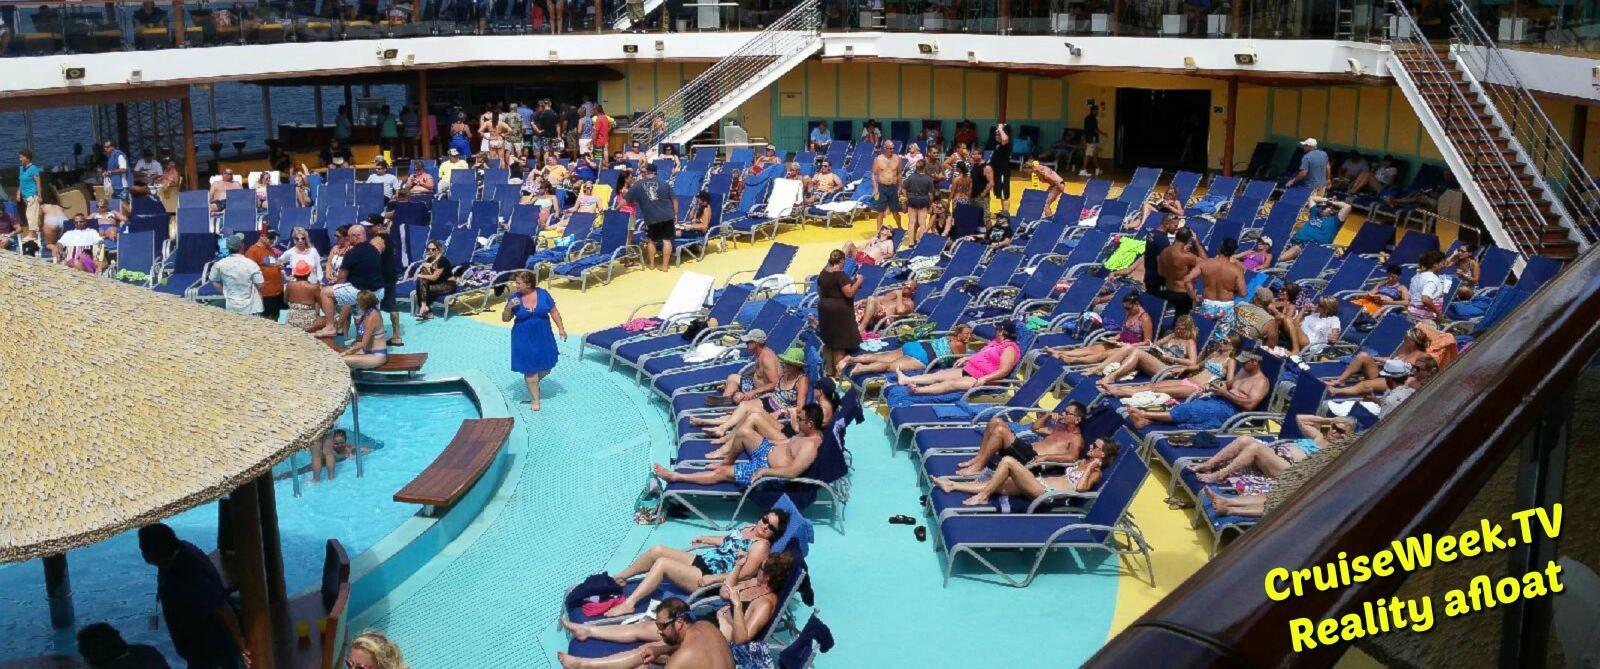 Cruise ship show reality 12 TV